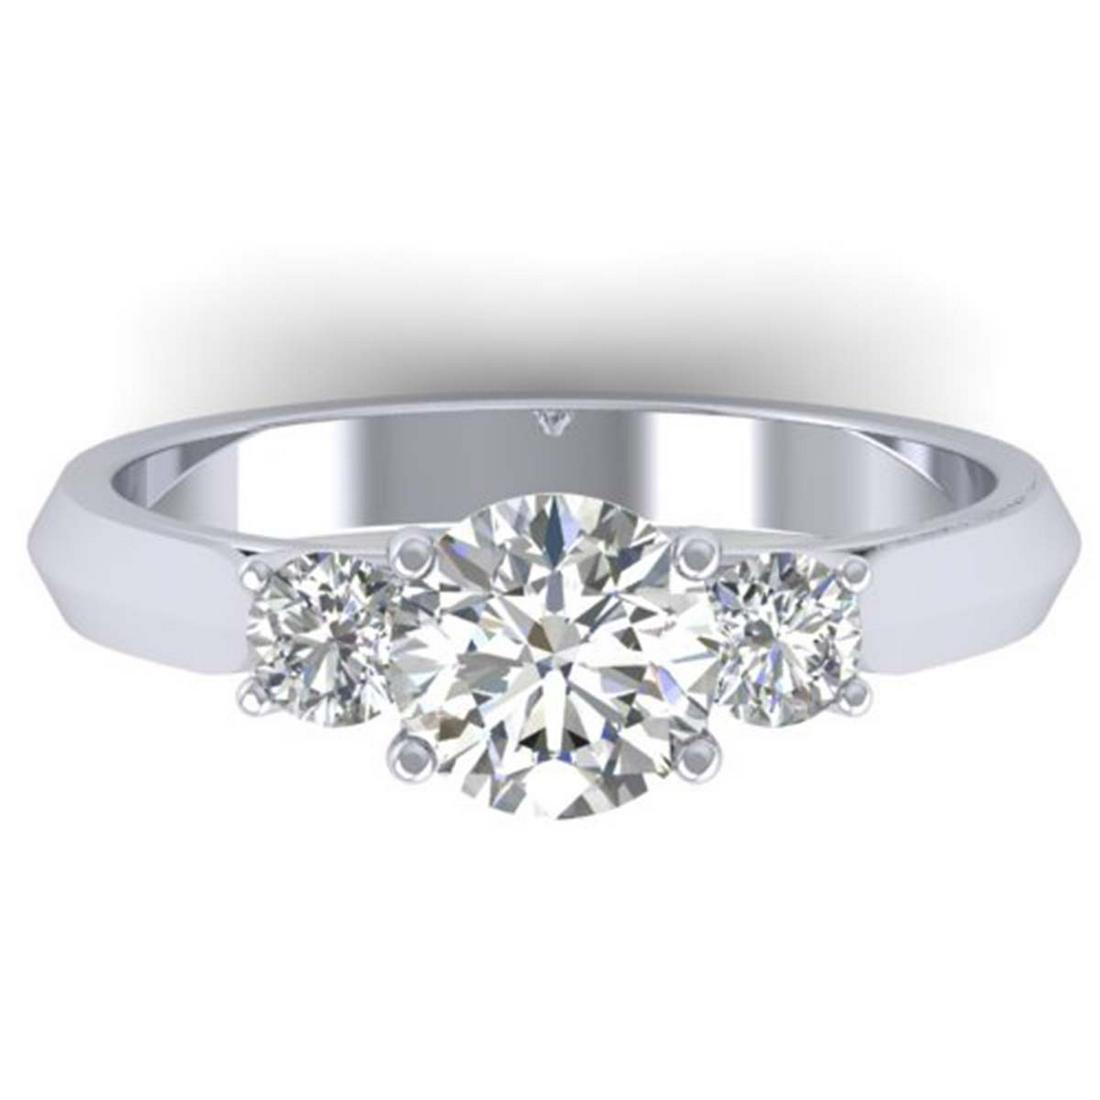 1.50 ctw VS/SI Diamond Solitaire 3 Stone Ring 18K White